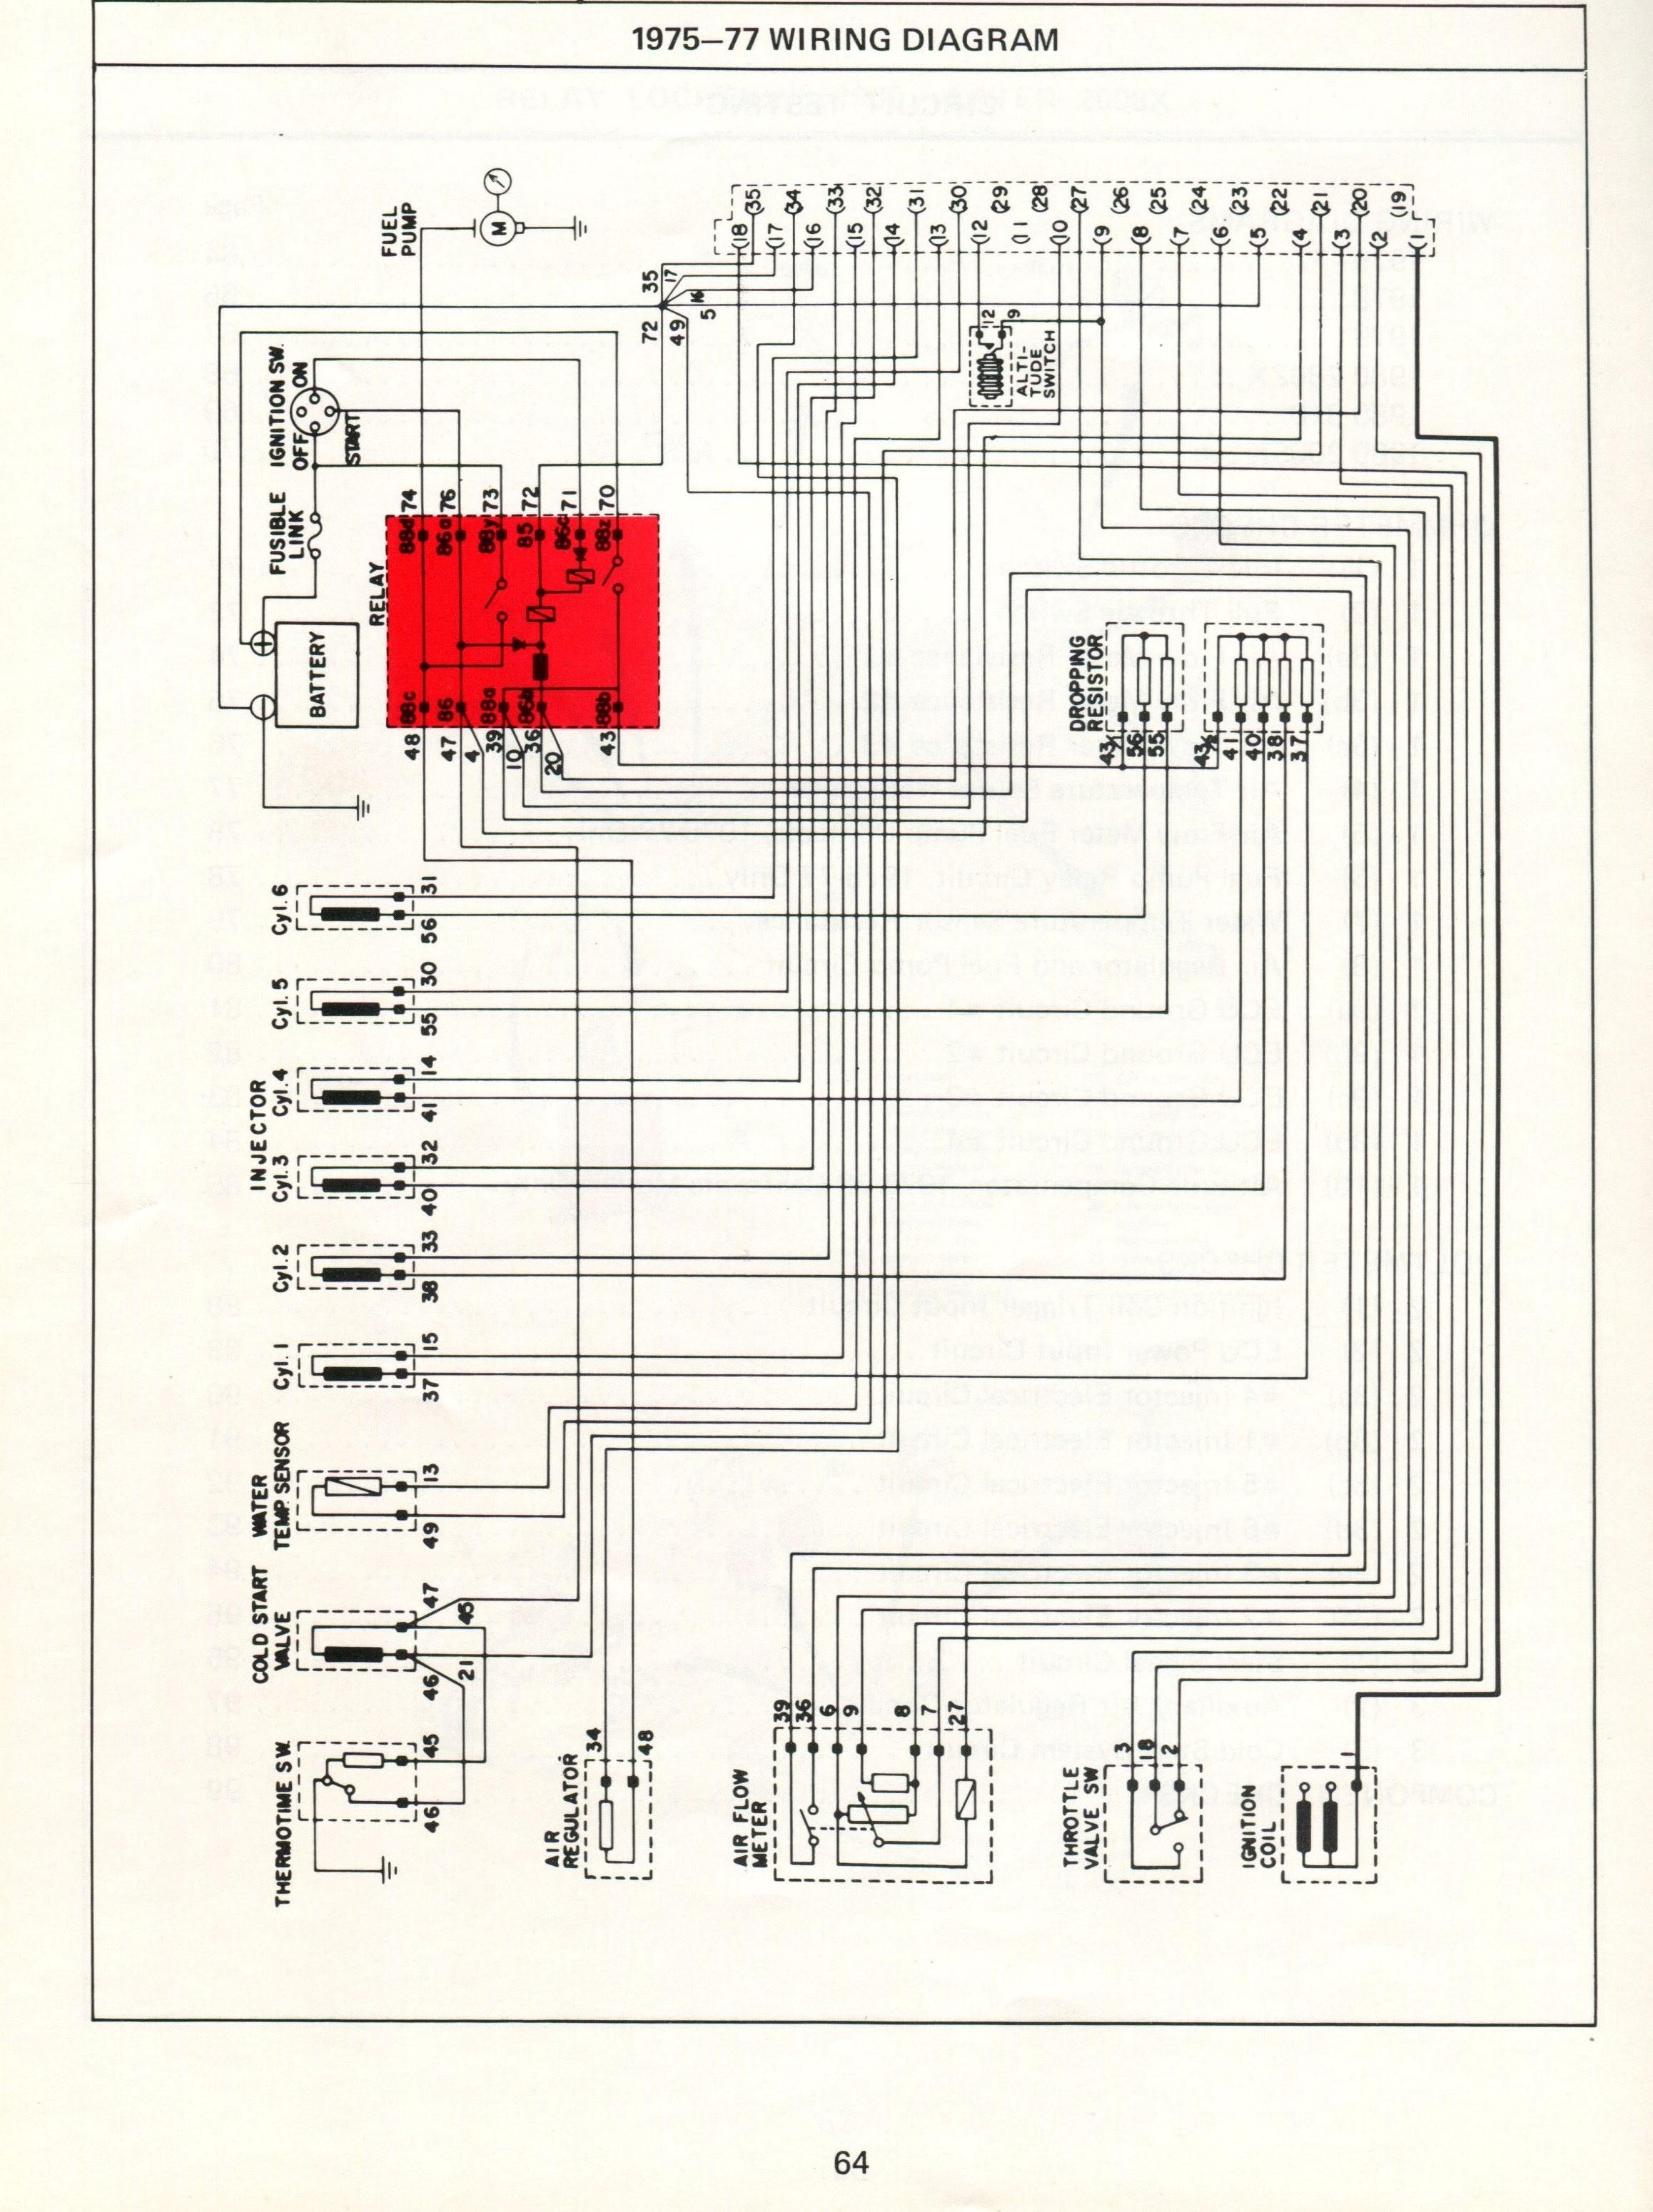 Diagram 78 280z Injector Wiring Diagram Full Version Hd Quality Wiring Diagram Diagramsernae Gisbertovalori It